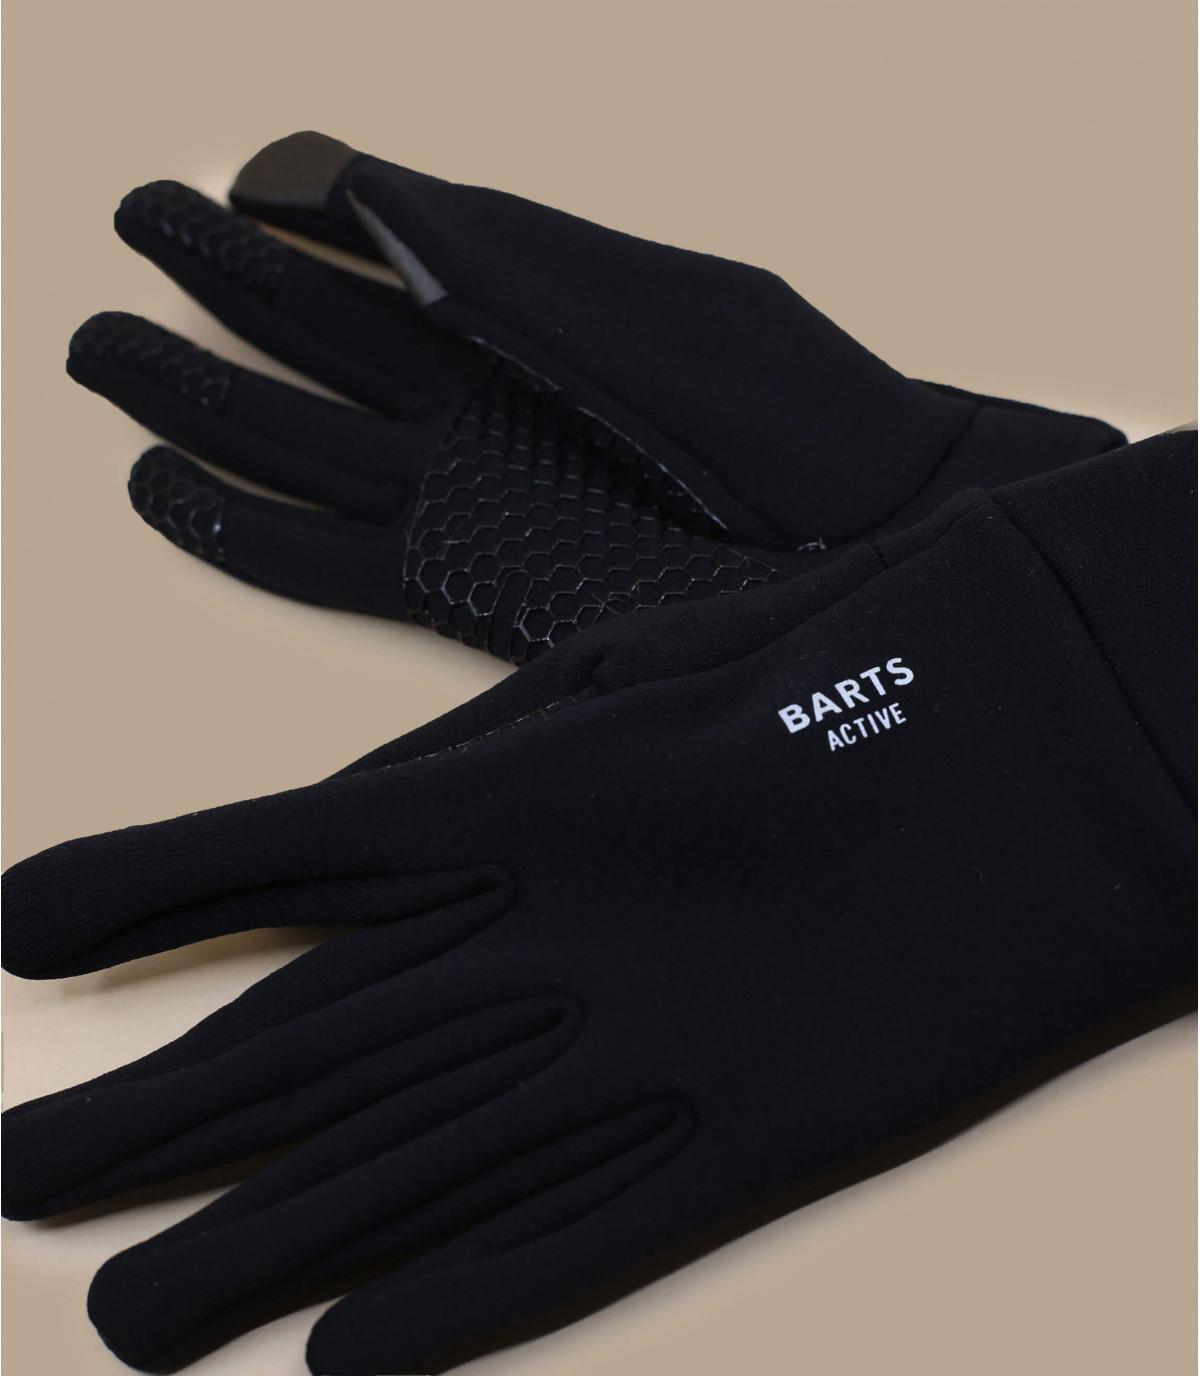 Détails Powerstretch touch gloves black - image 3